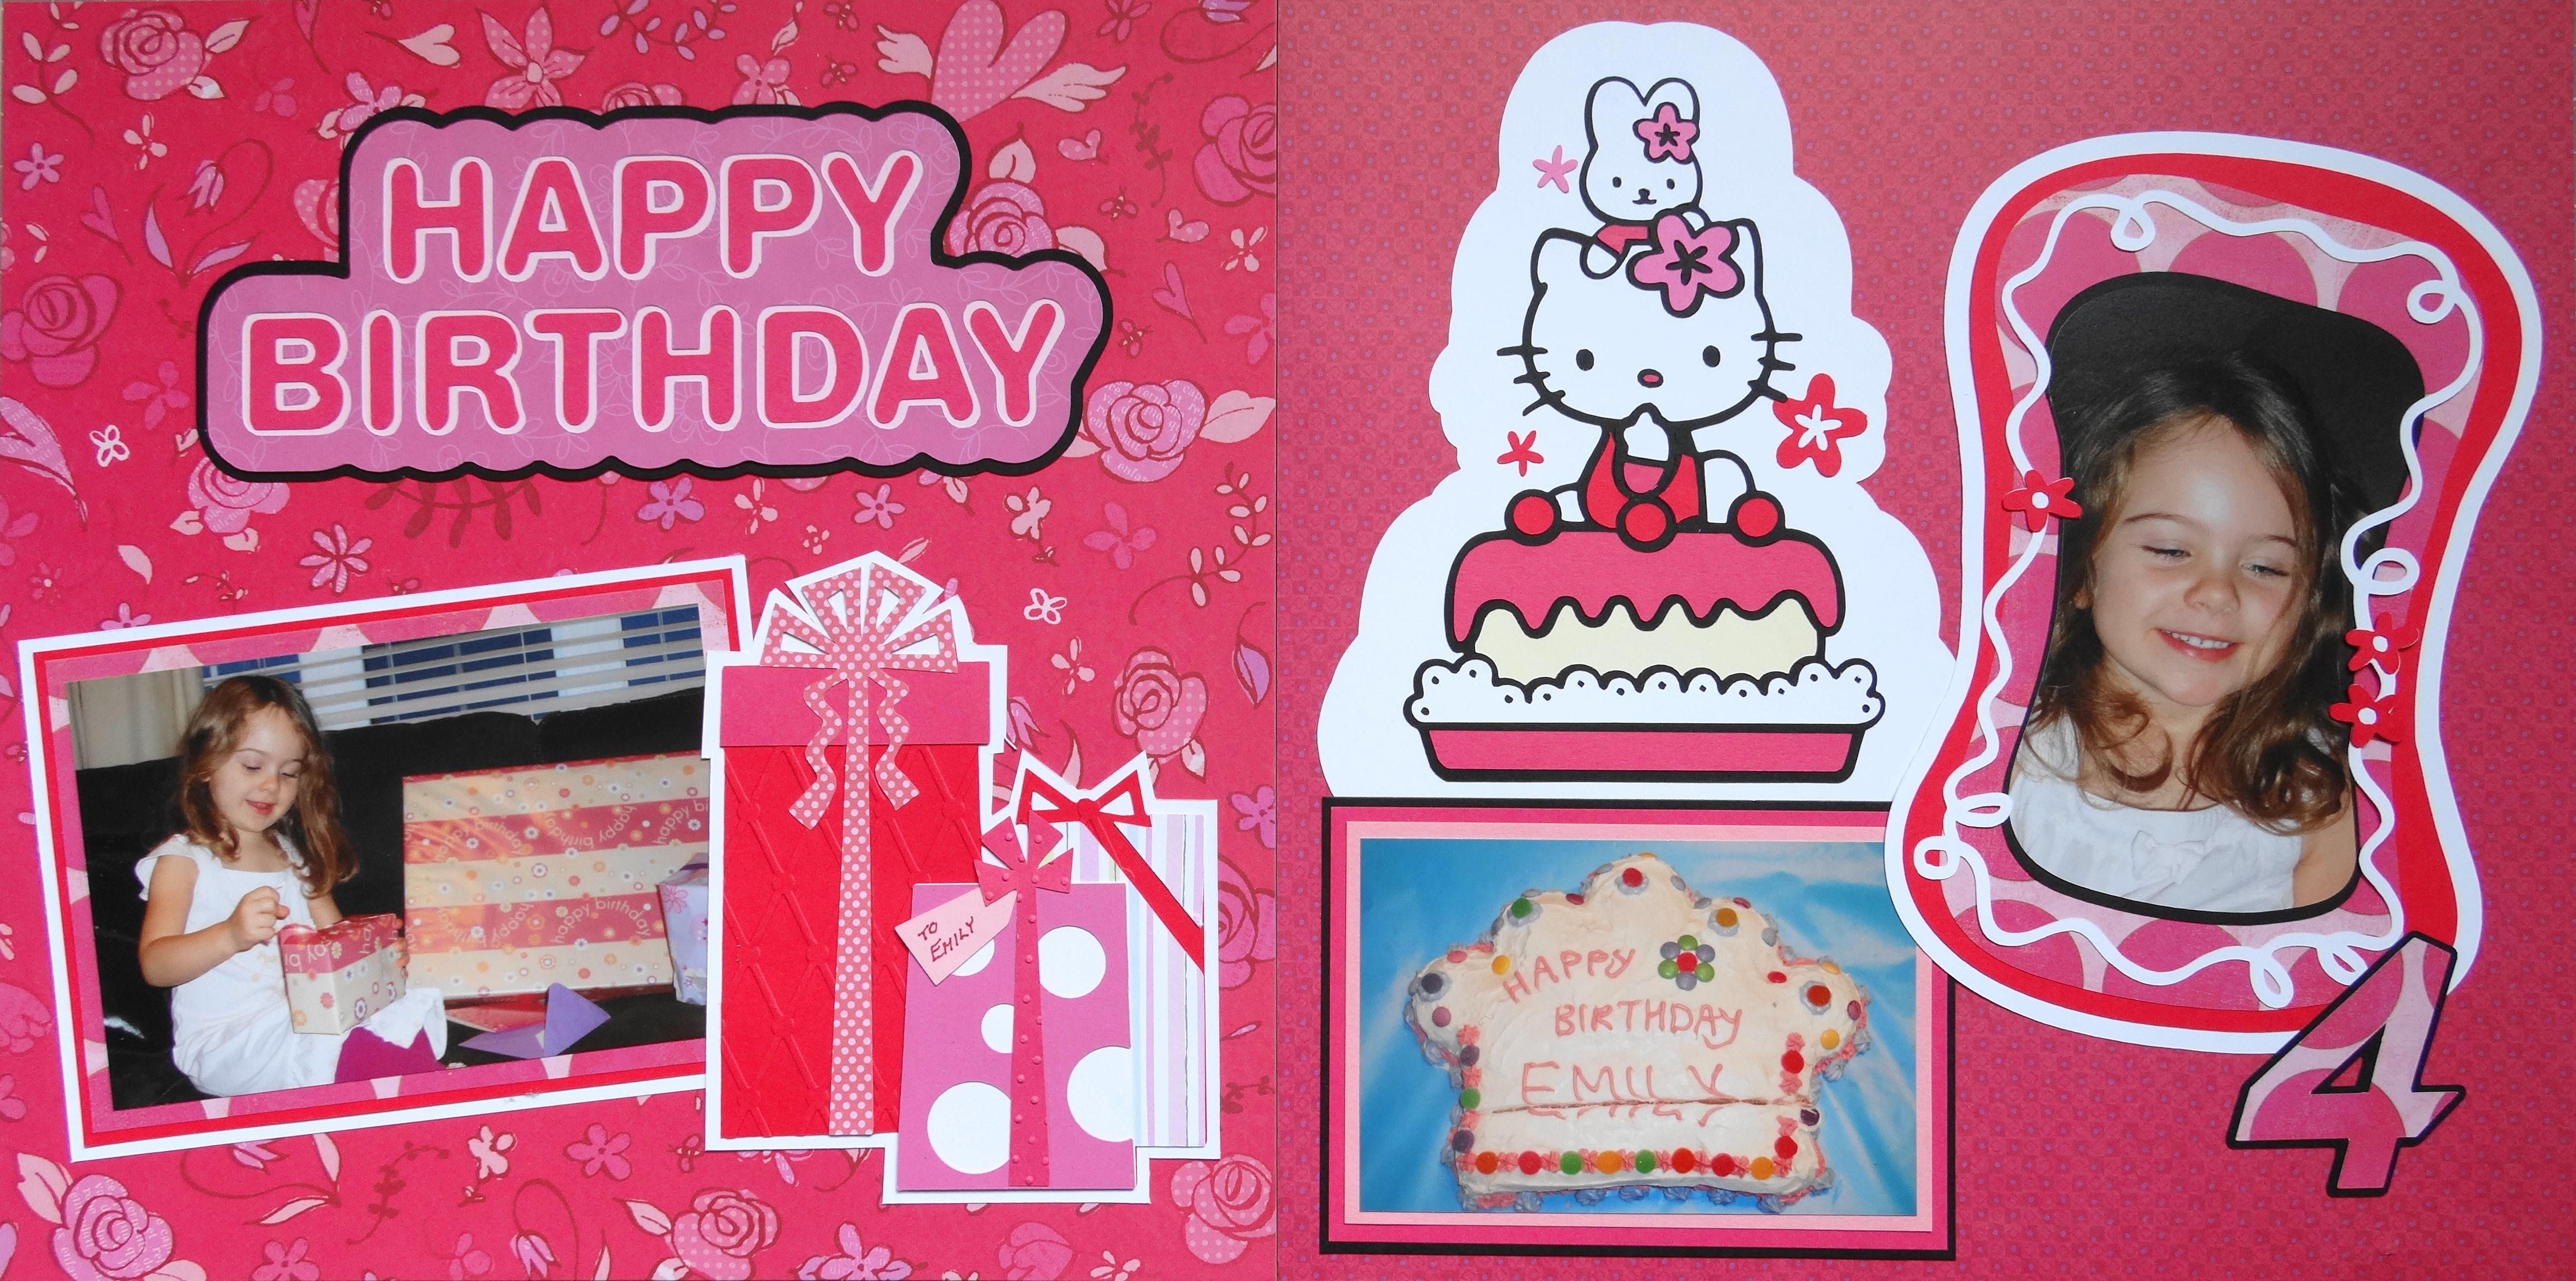 Scrapbook ideas hello kitty - Girl S Birthday Scrapbook Page Idea With Hello Kitty Theme Cake And Presents From Everyday Life Album